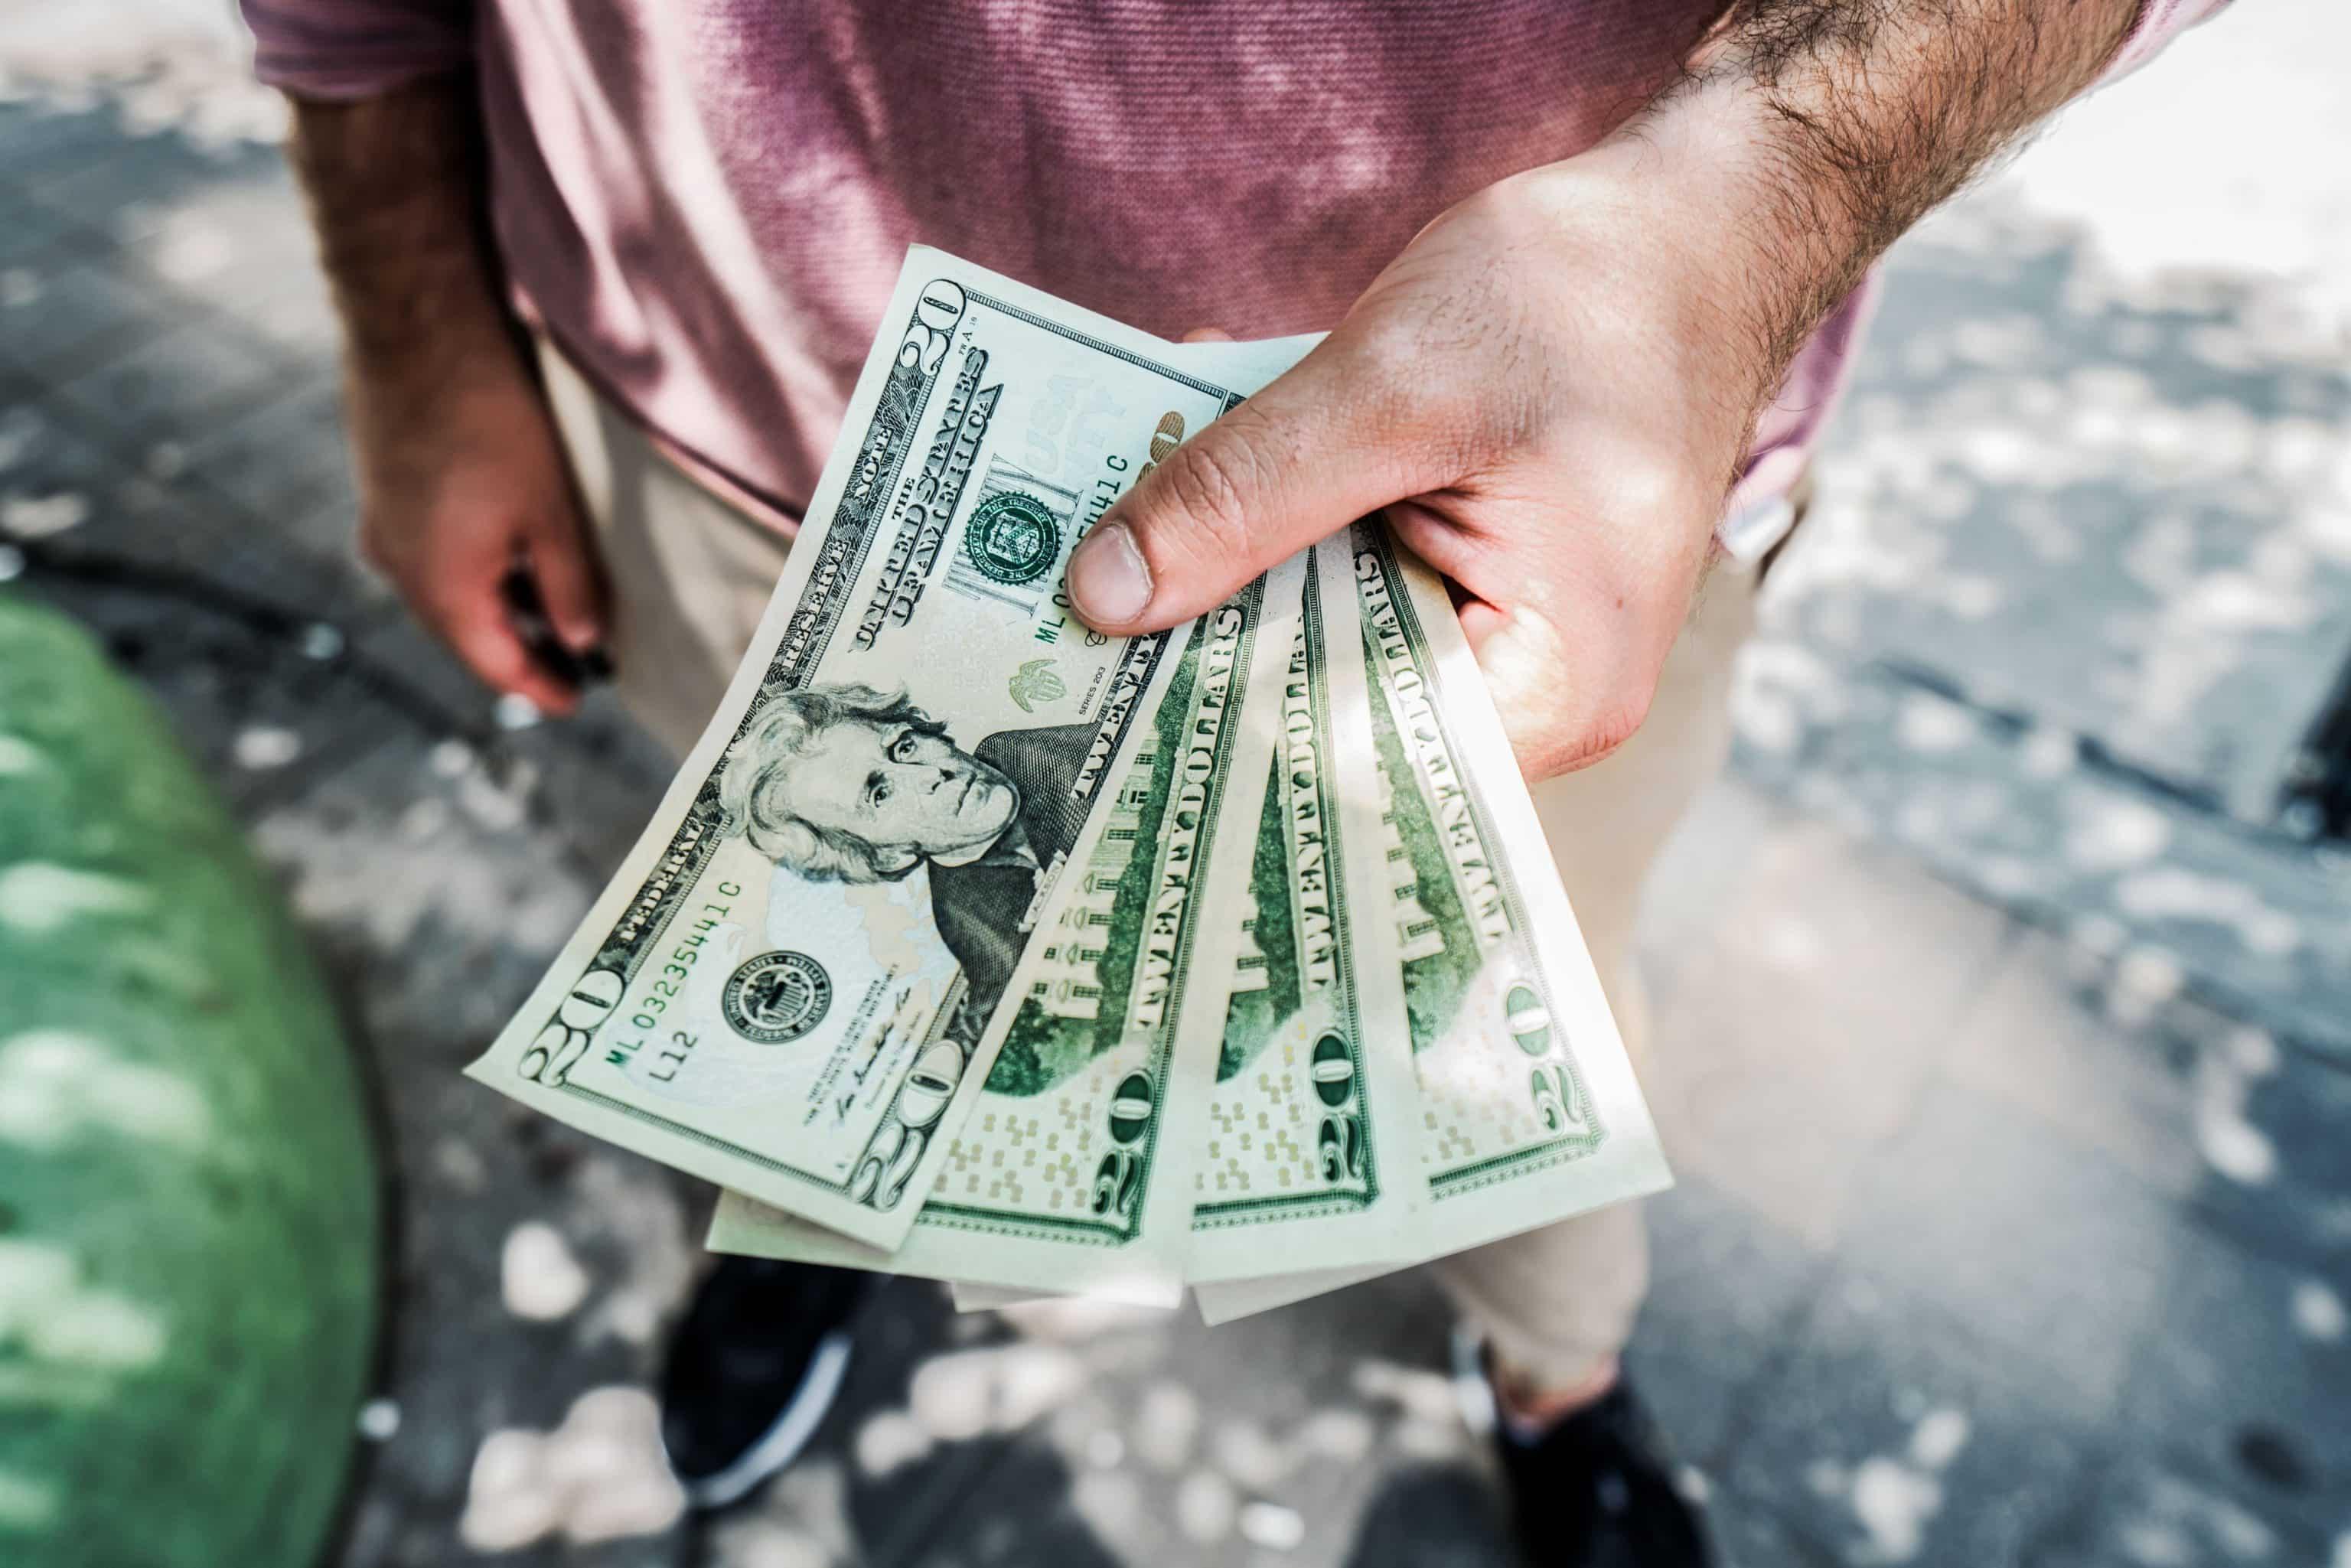 Jangan sampai telat bayar utang baru